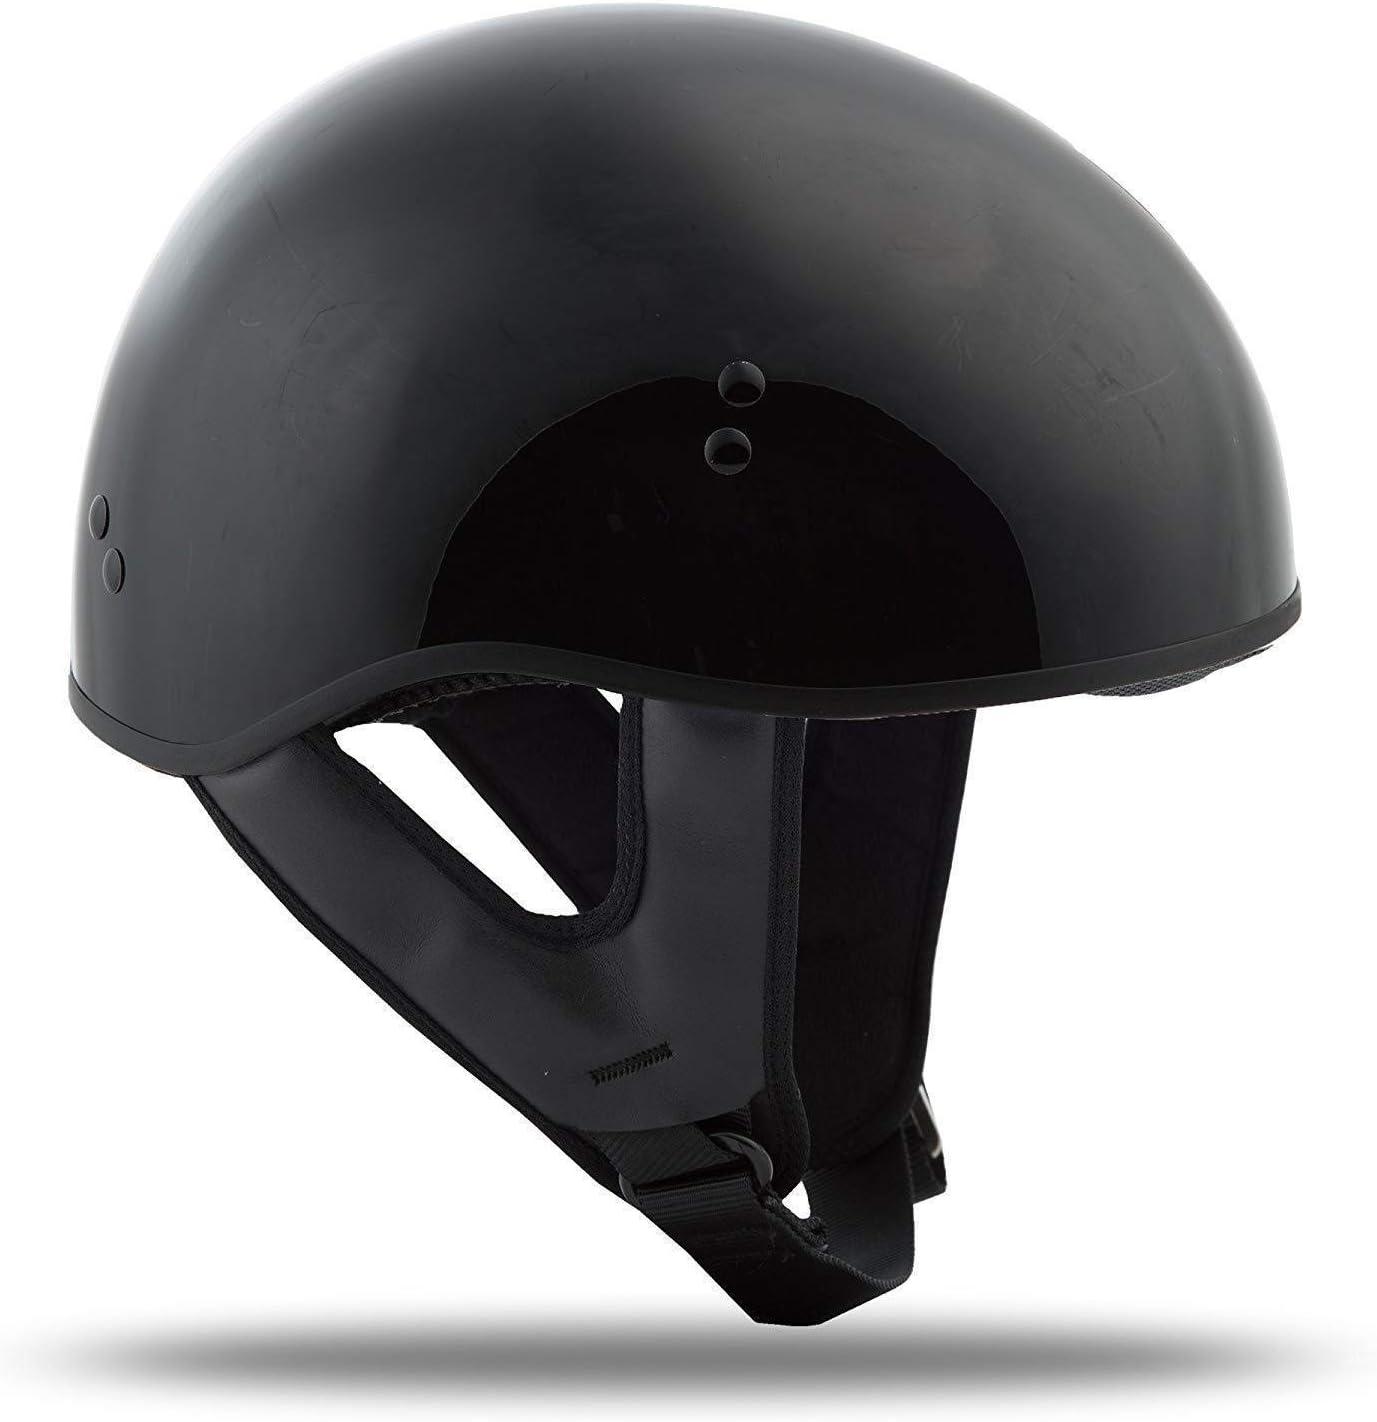 Gmax GM45 Naked Adult Motorcycle Cruiser Half 1//2 Helmet Flat or Gloss Black